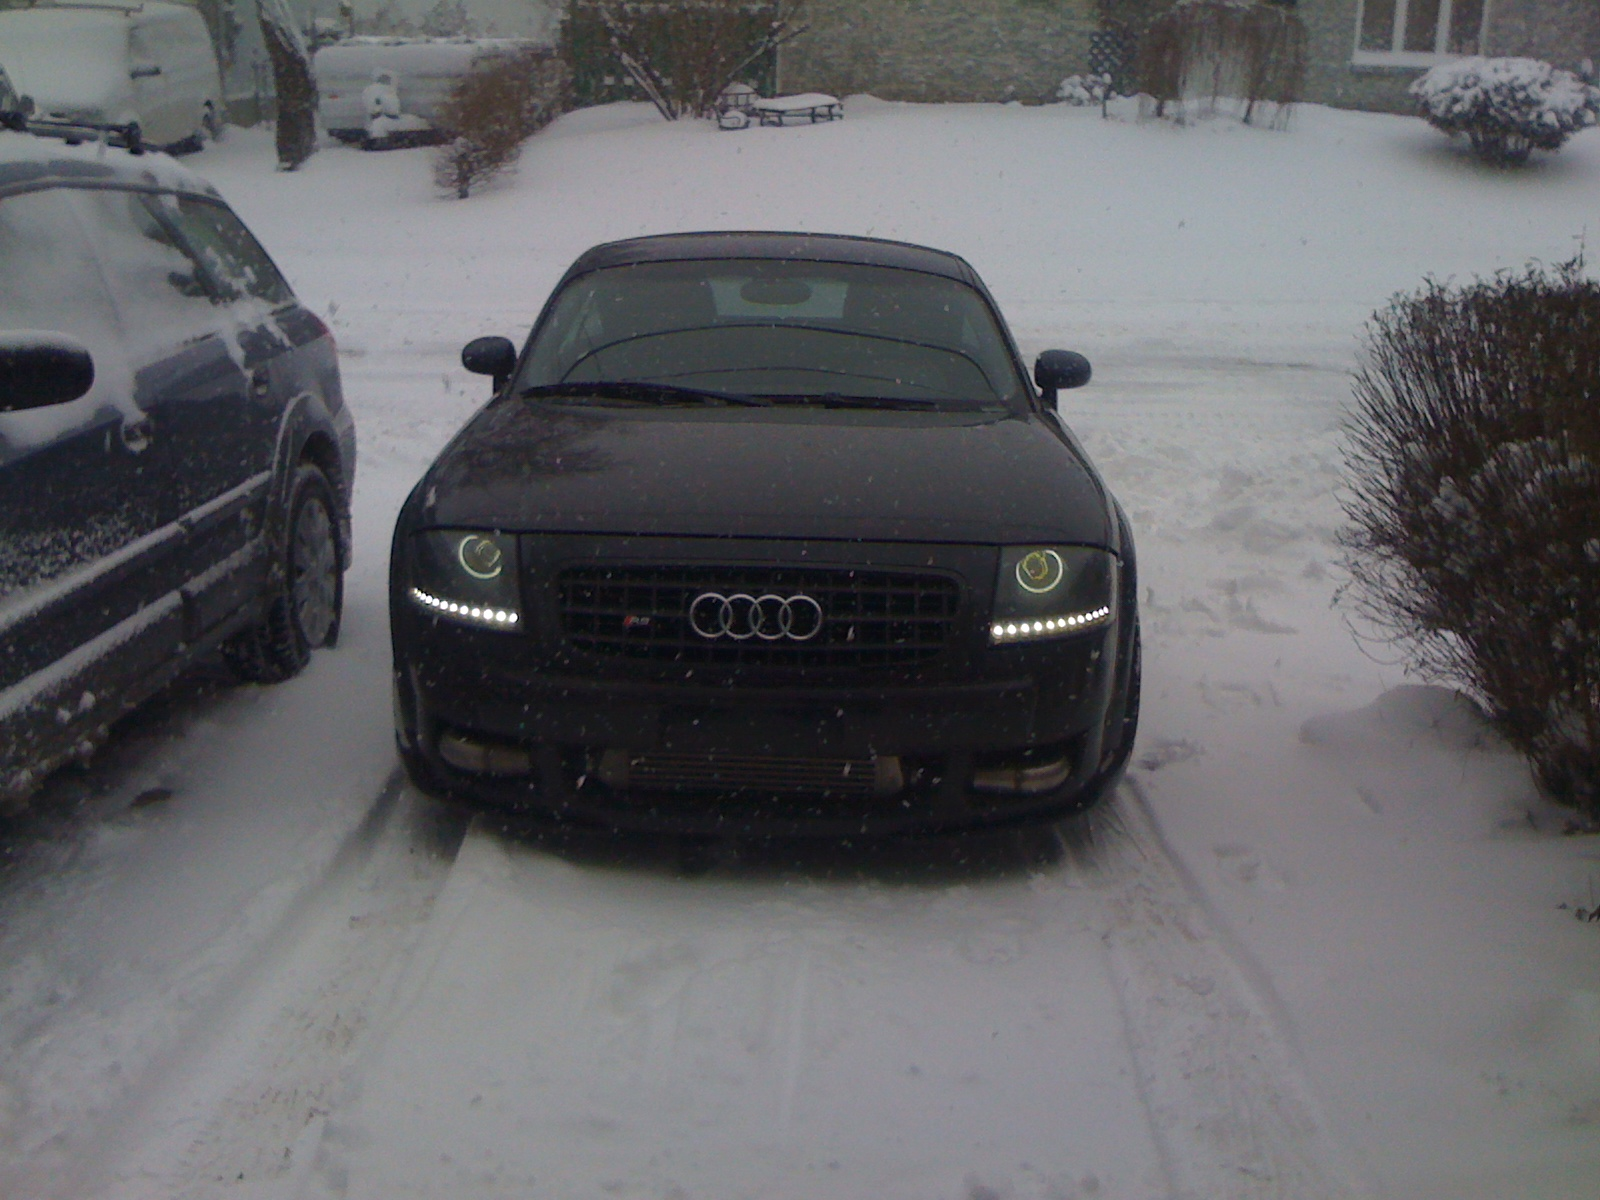 Audi TT 3.2 Turbo & Snow…